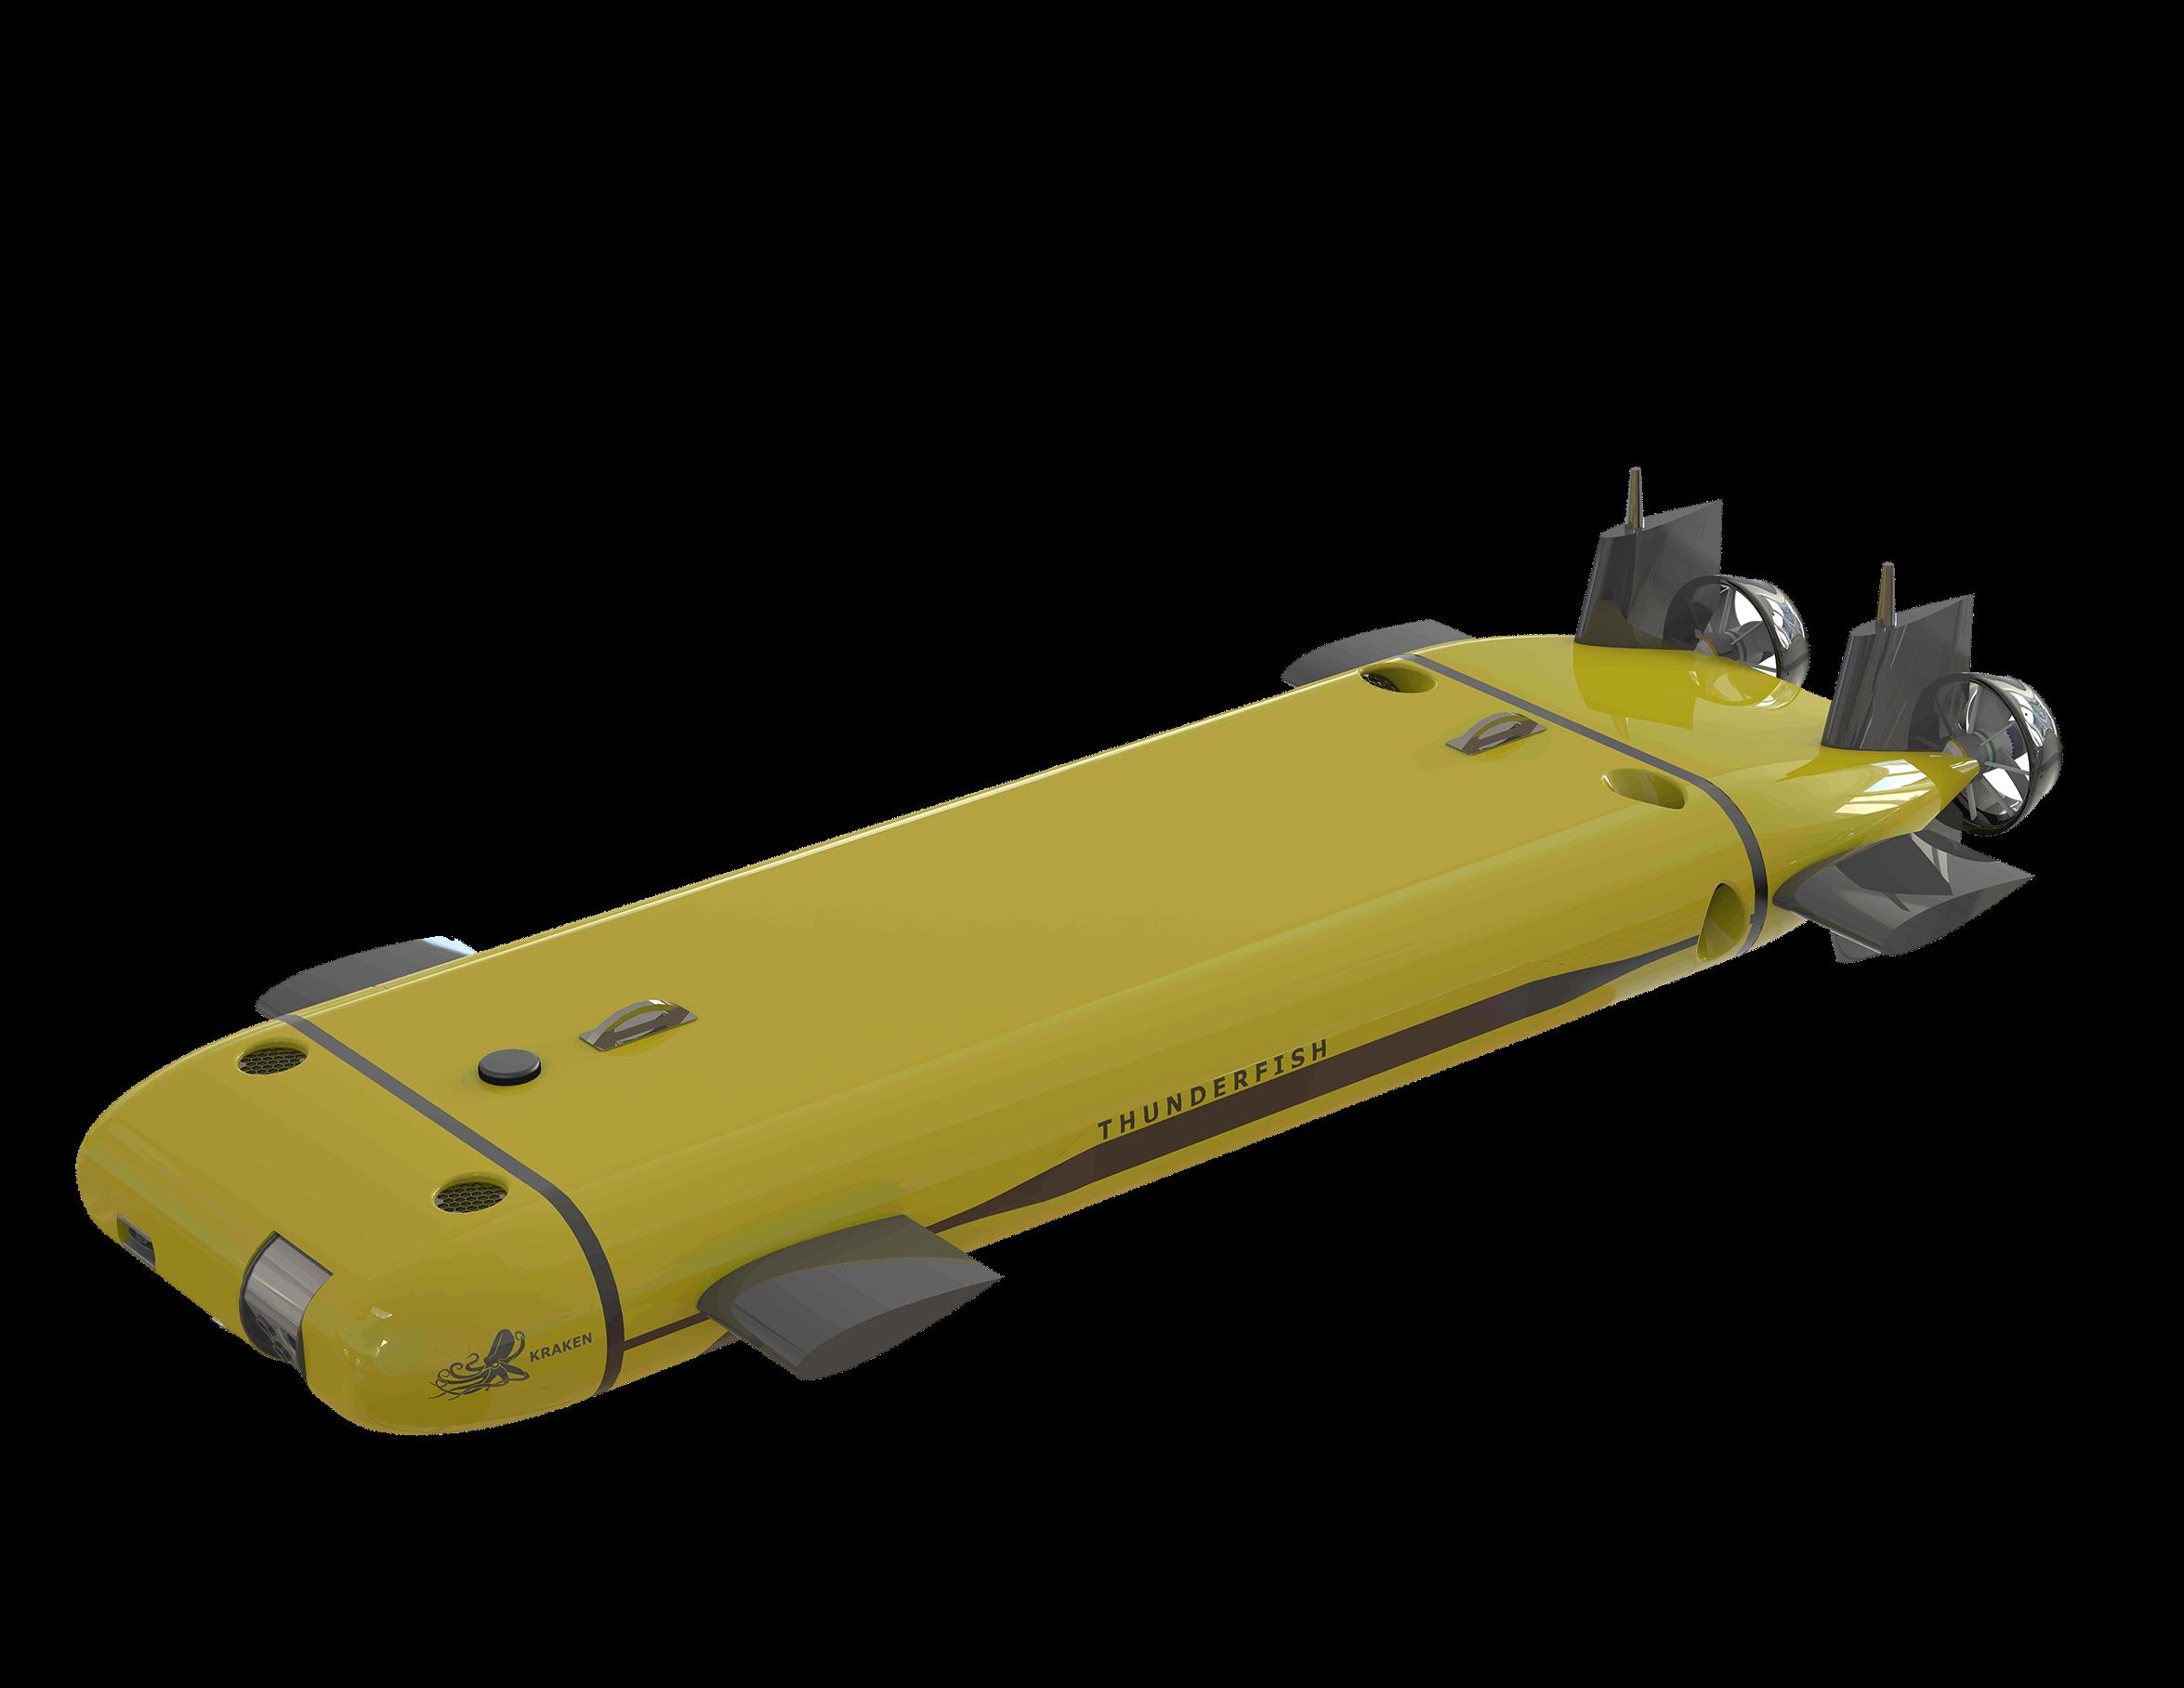 Thunderfish Kraken Robotics - Drones